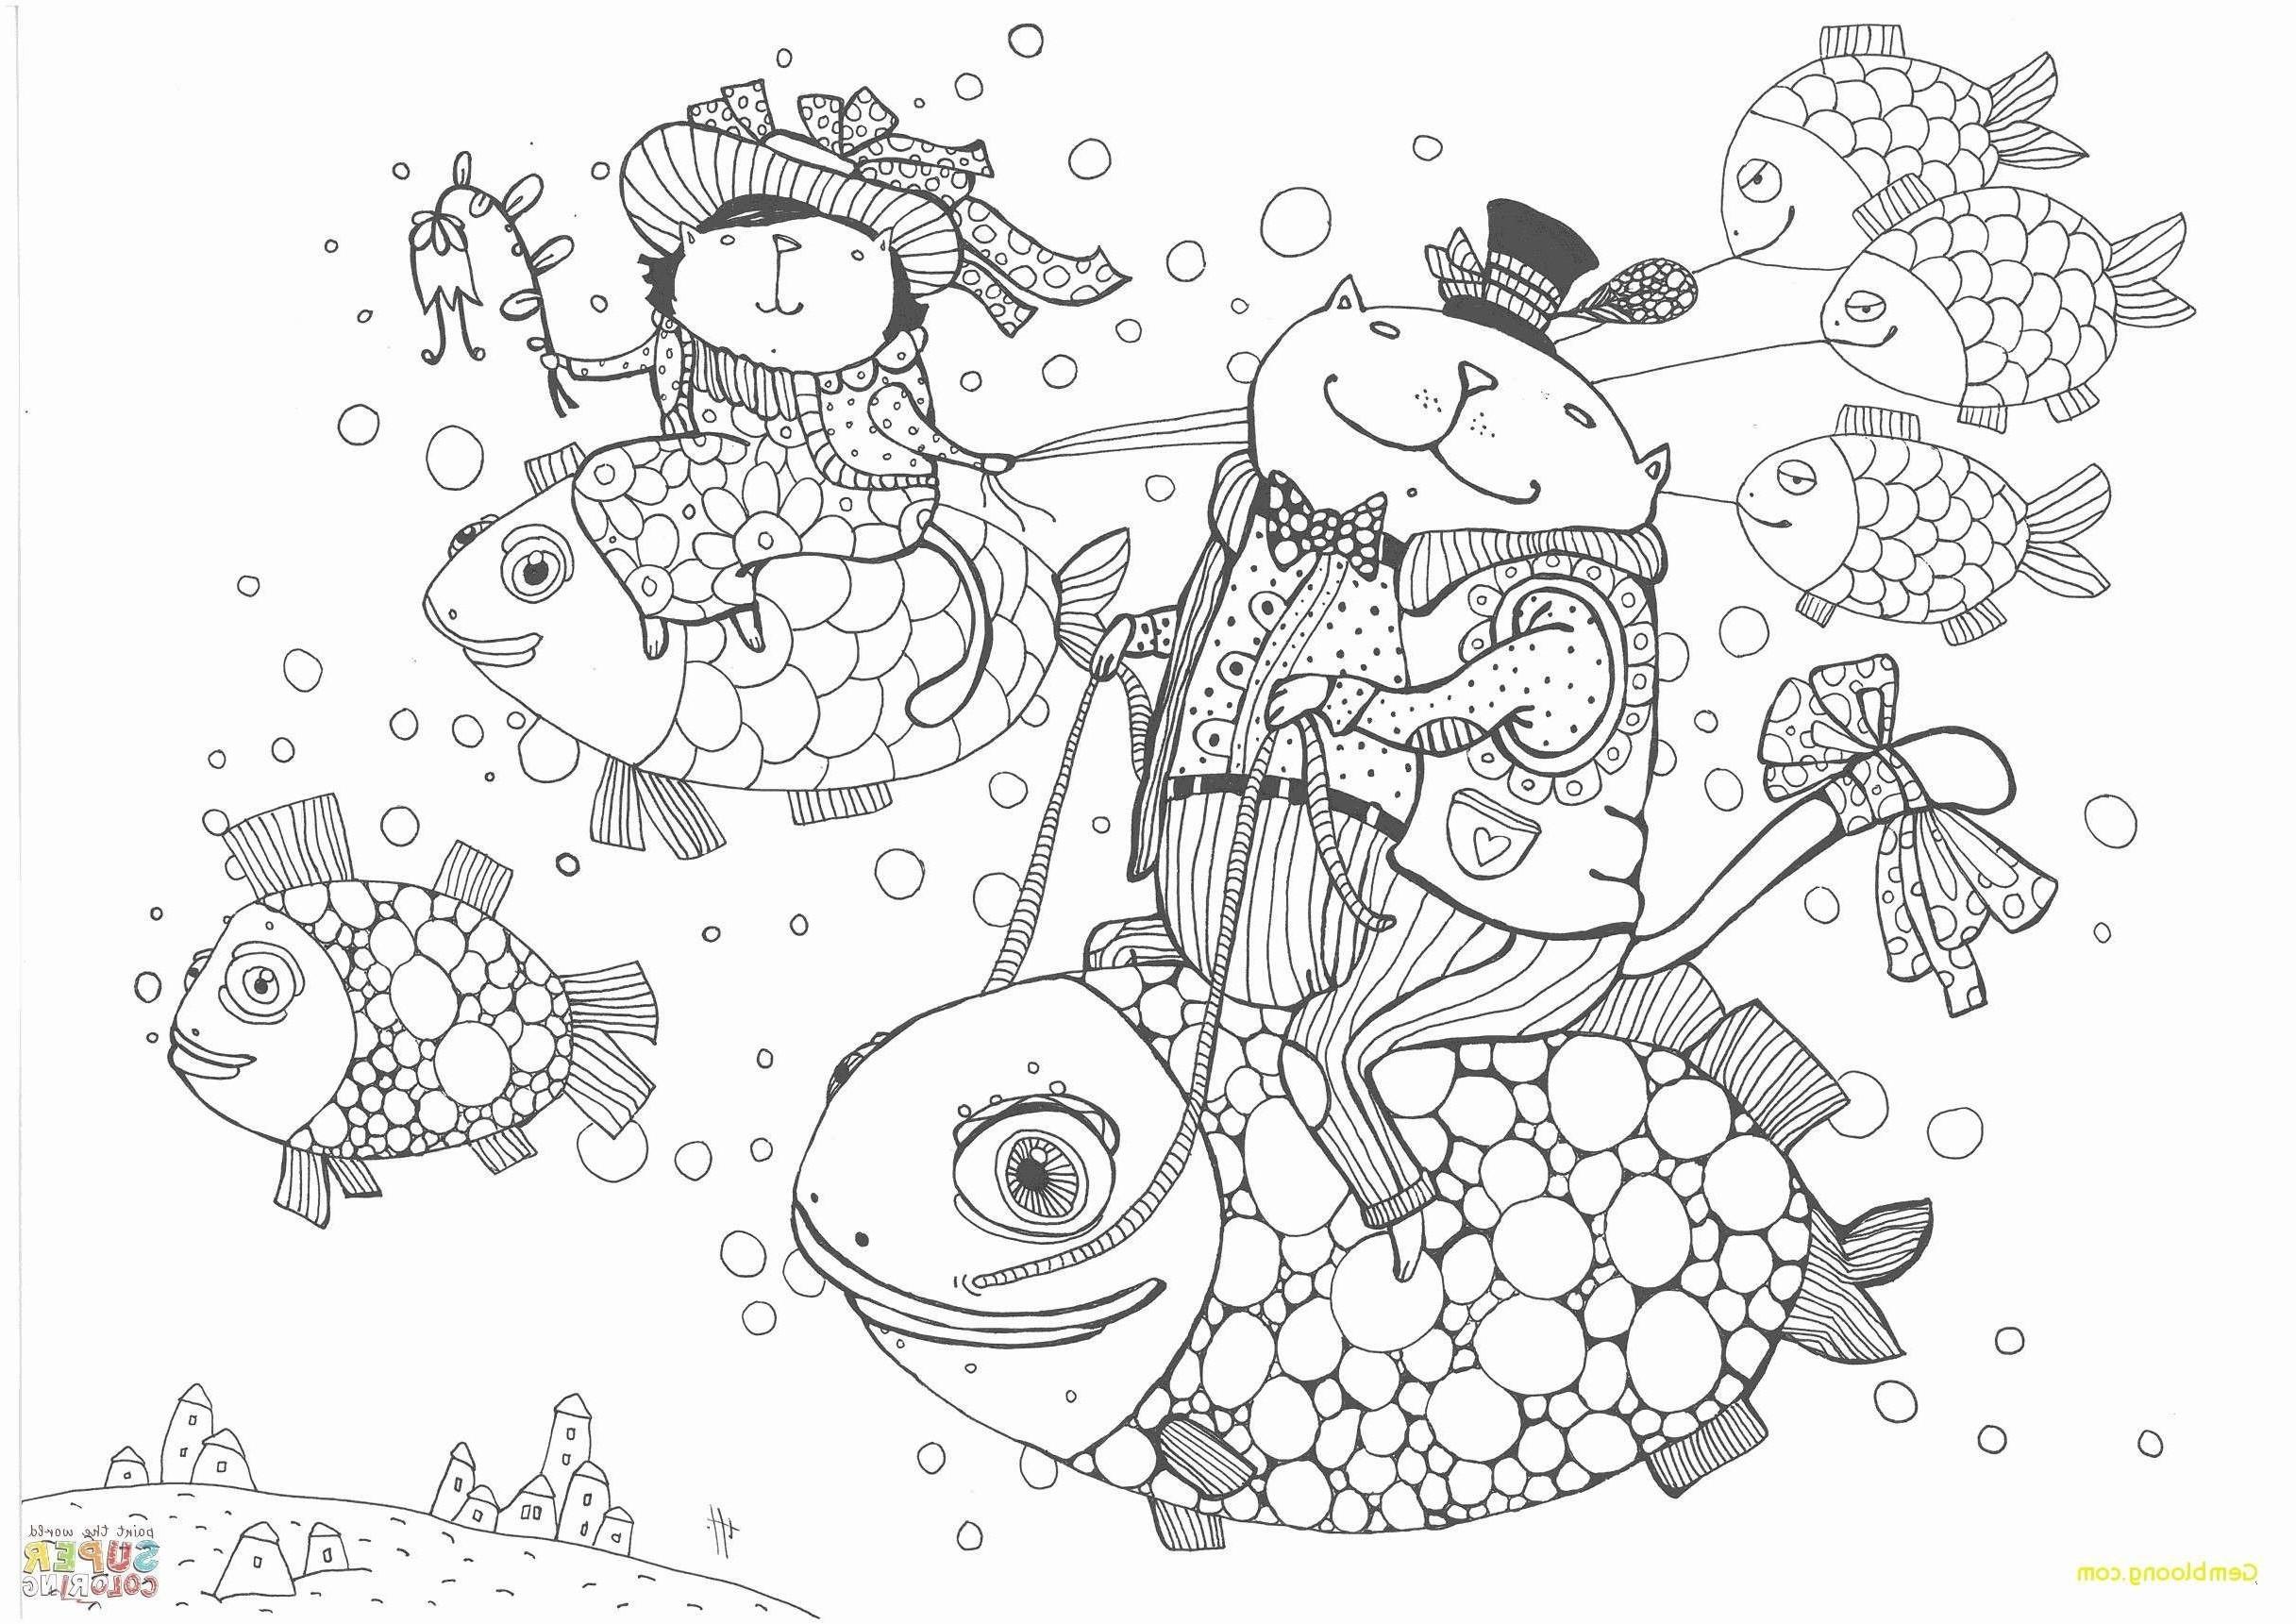 Mandala Herbst Zum Ausdrucken Genial 26 Elegant Herbst Mandalas Zum Ausdrucken – Malvorlagen Ideen Bild